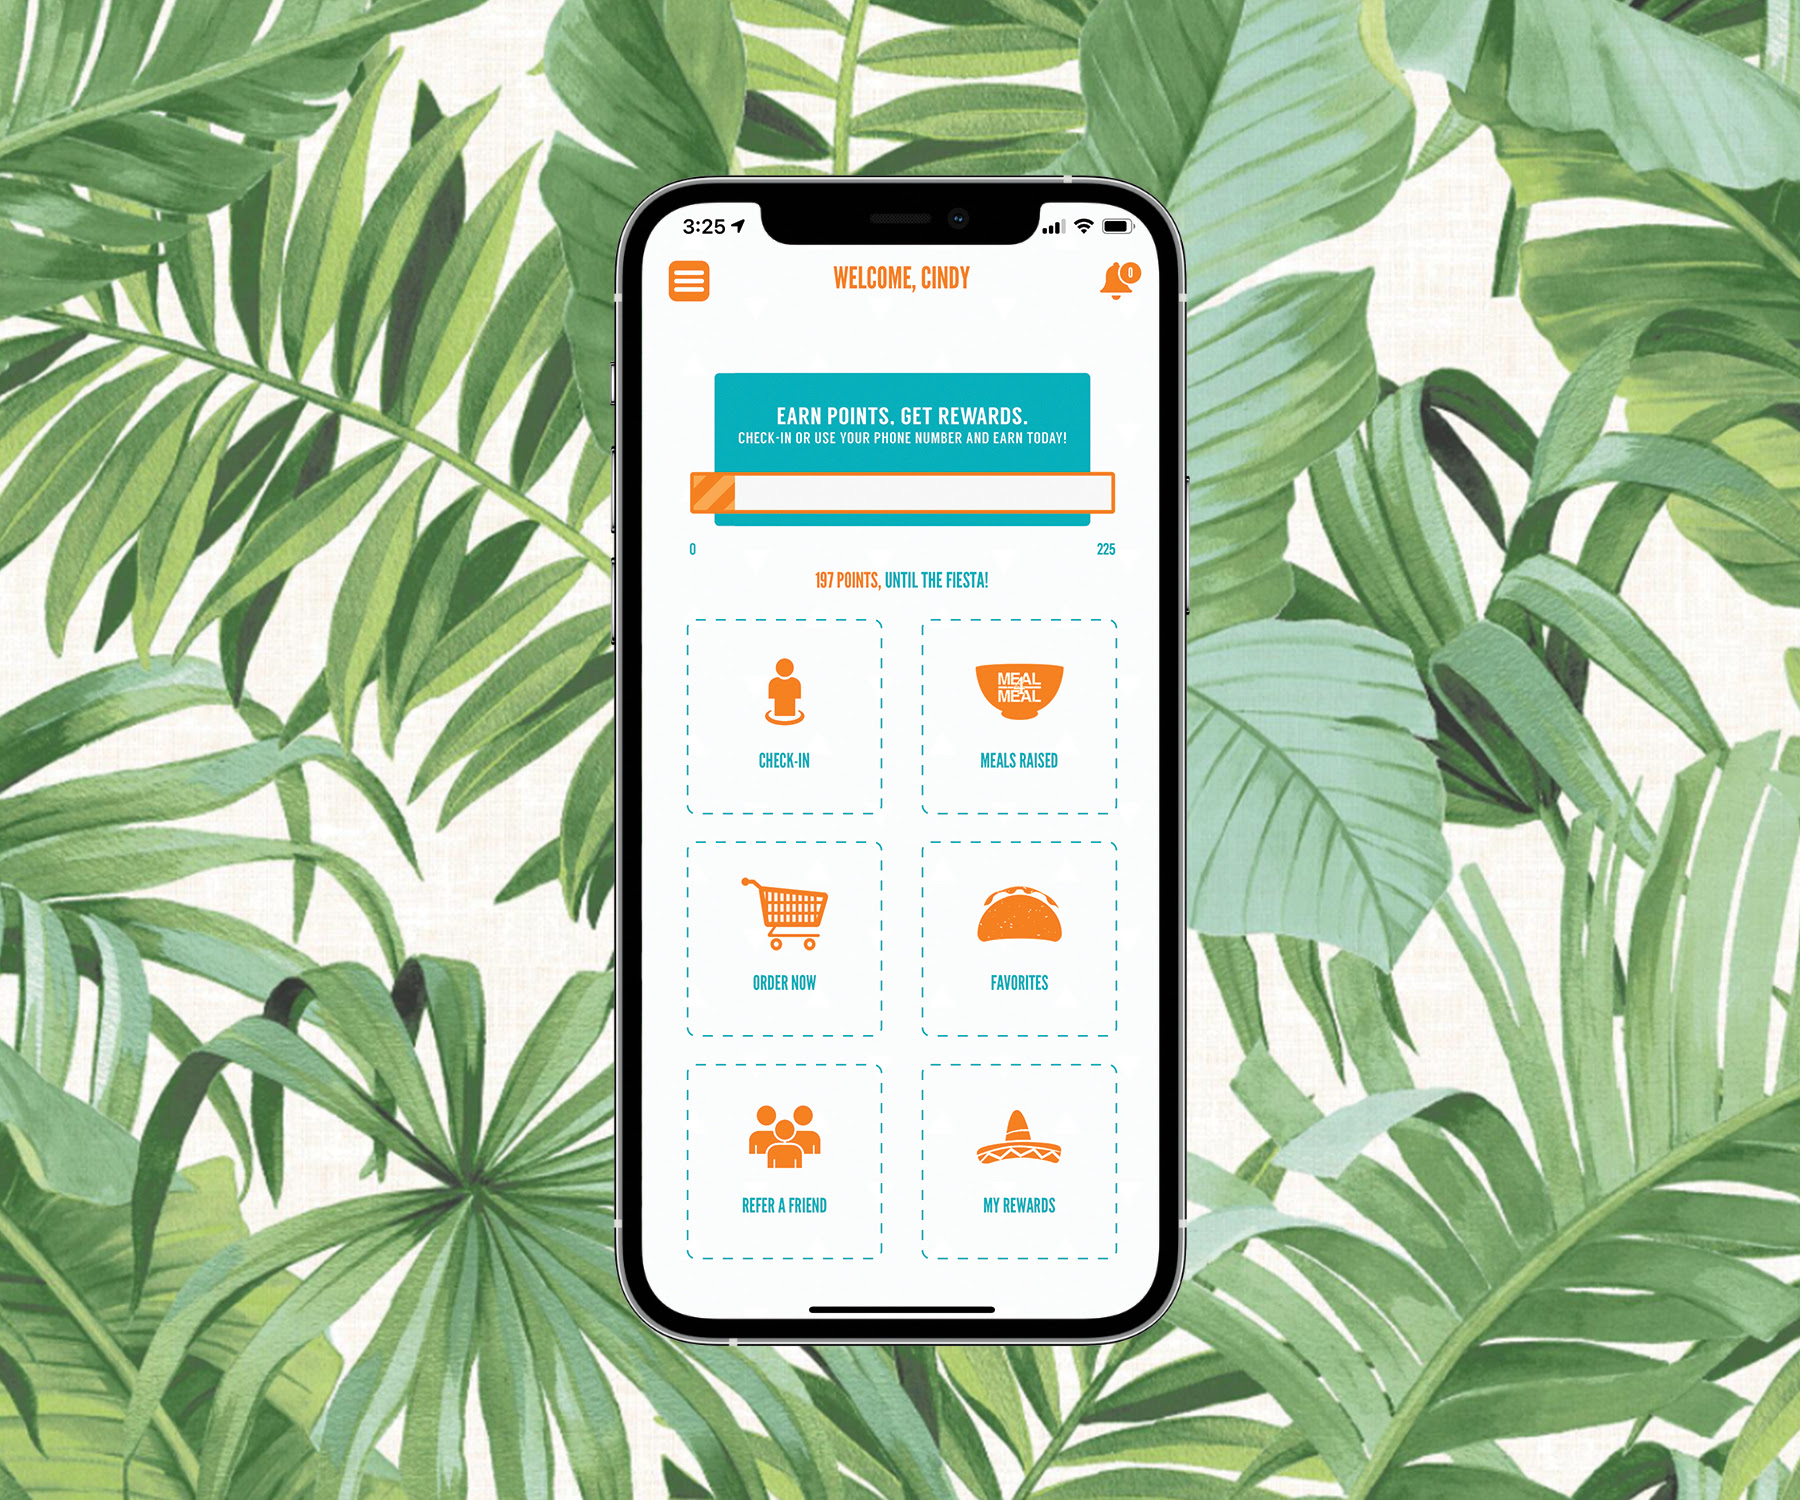 Tacos 4 Life Rewards App